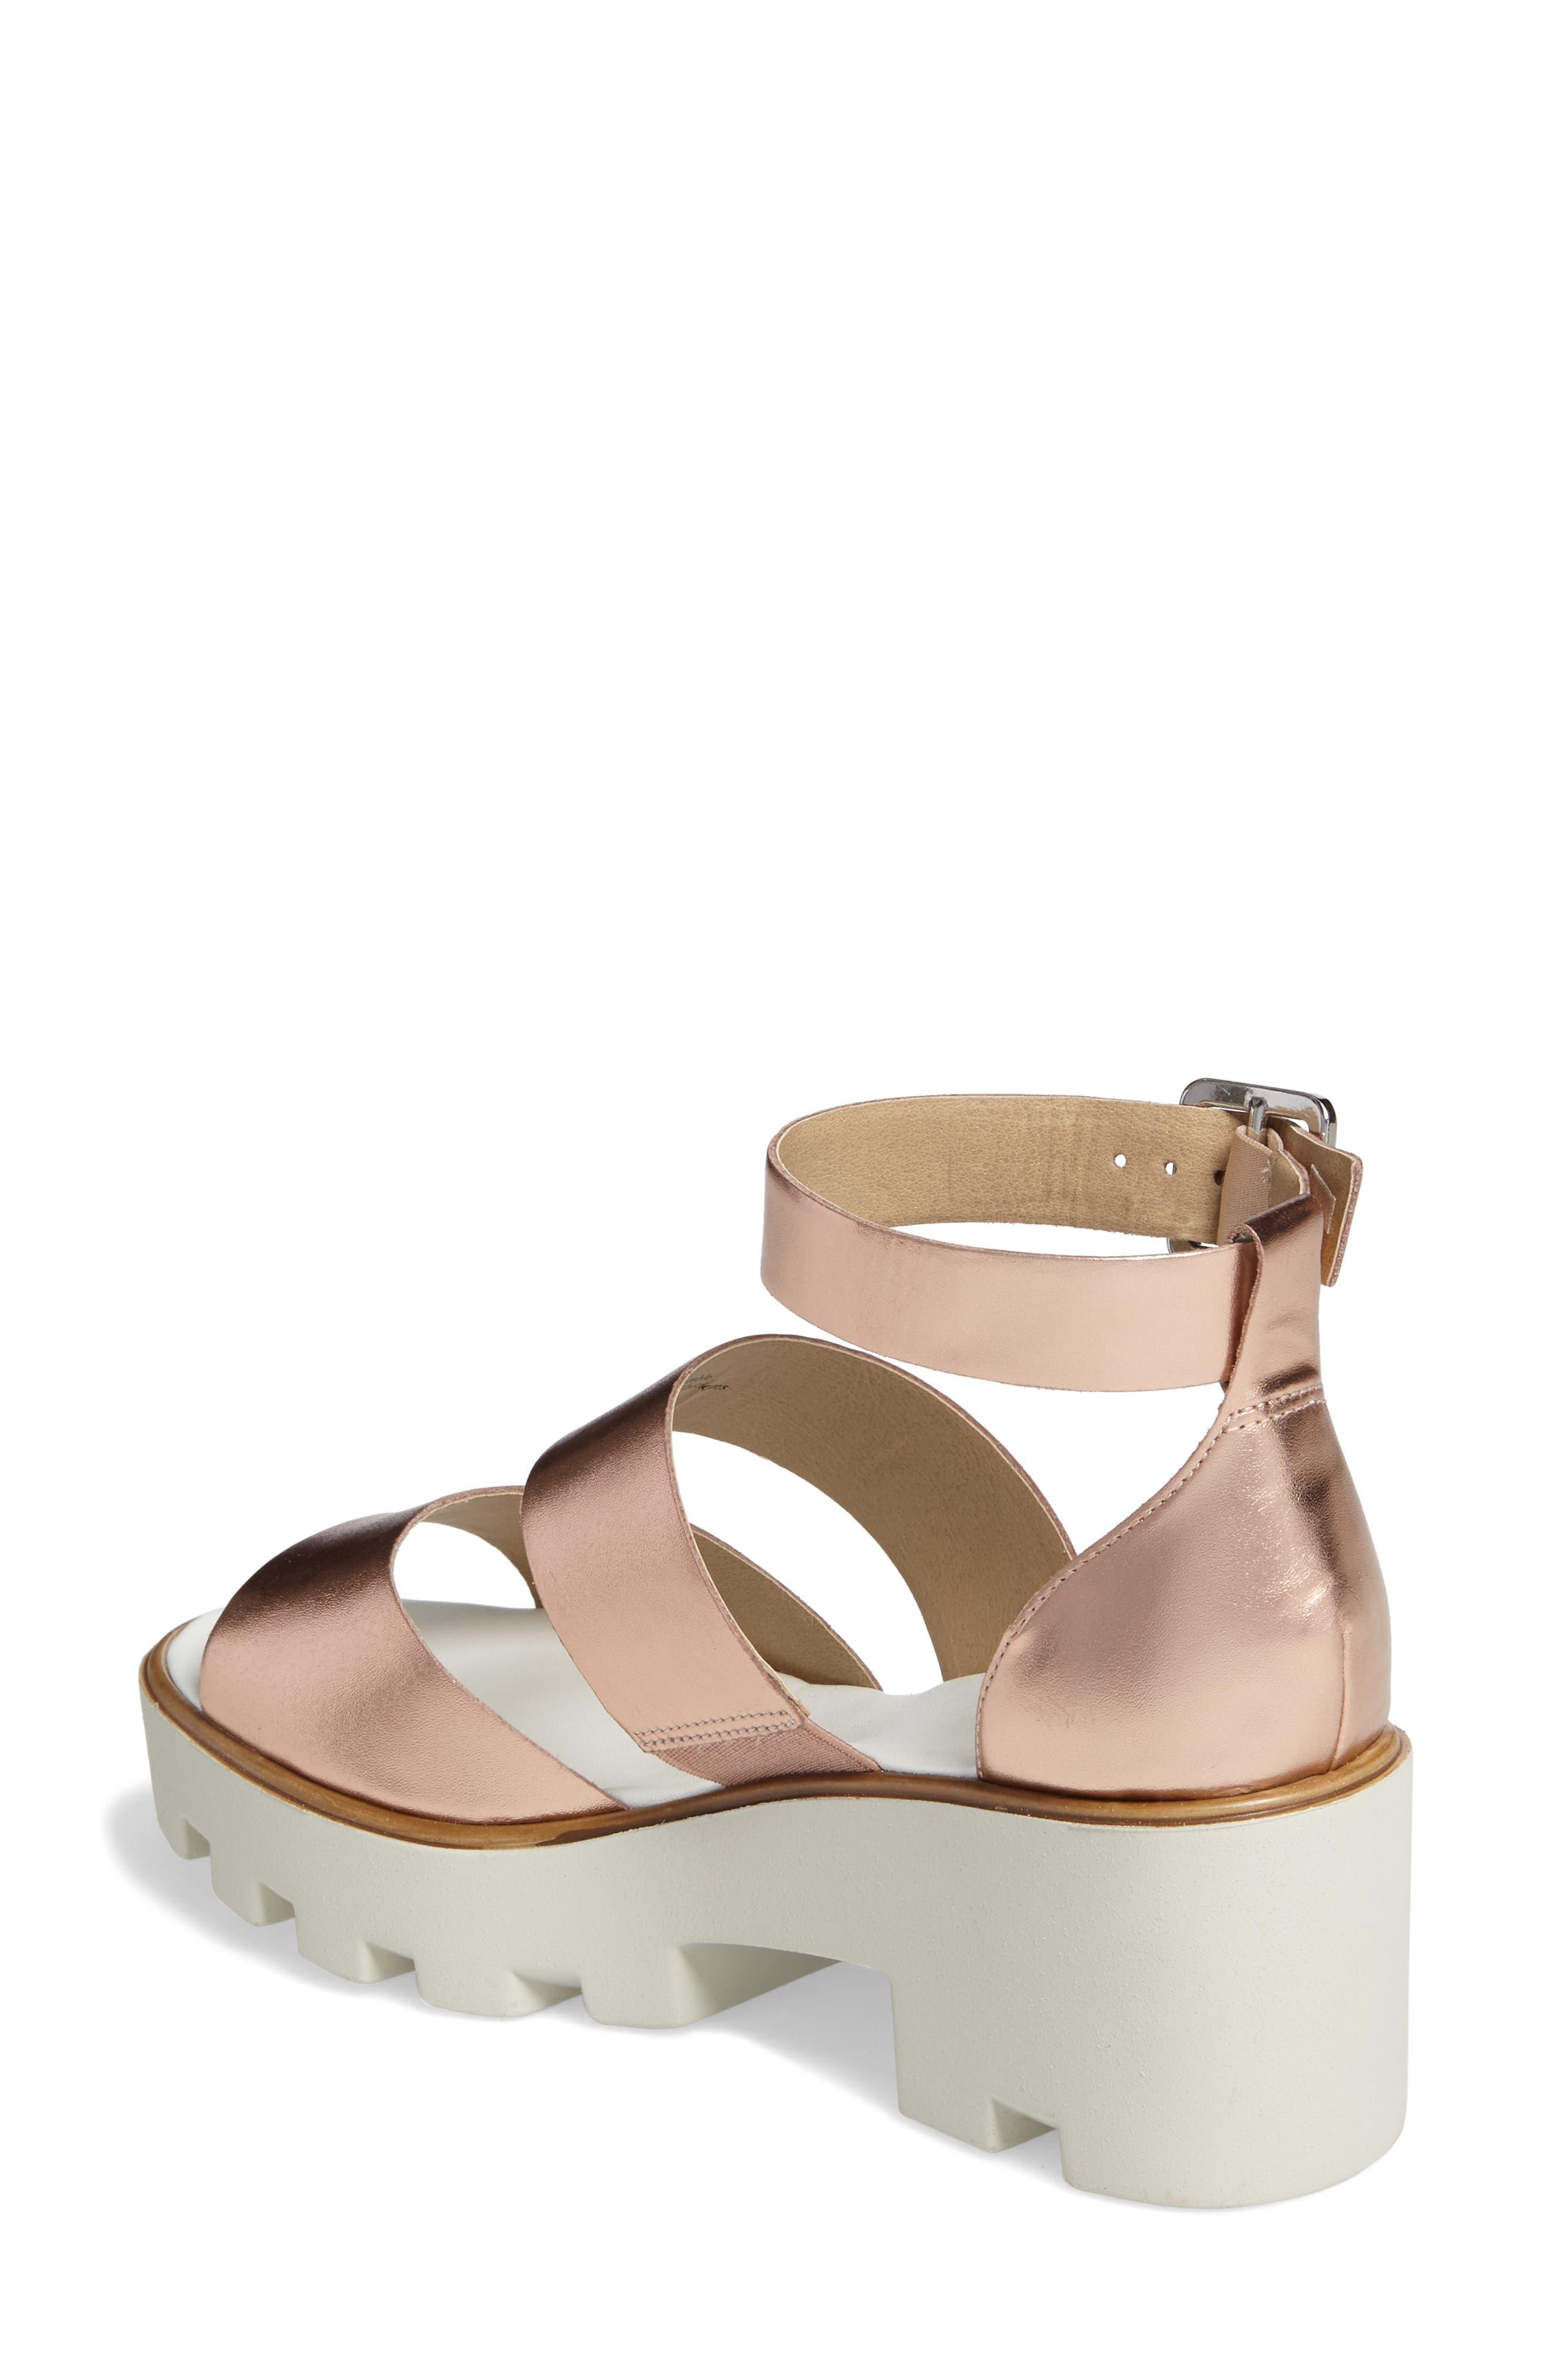 Rowan Platform Sandal,                             Alternate thumbnail 2, color,                             Rose Gold Leather